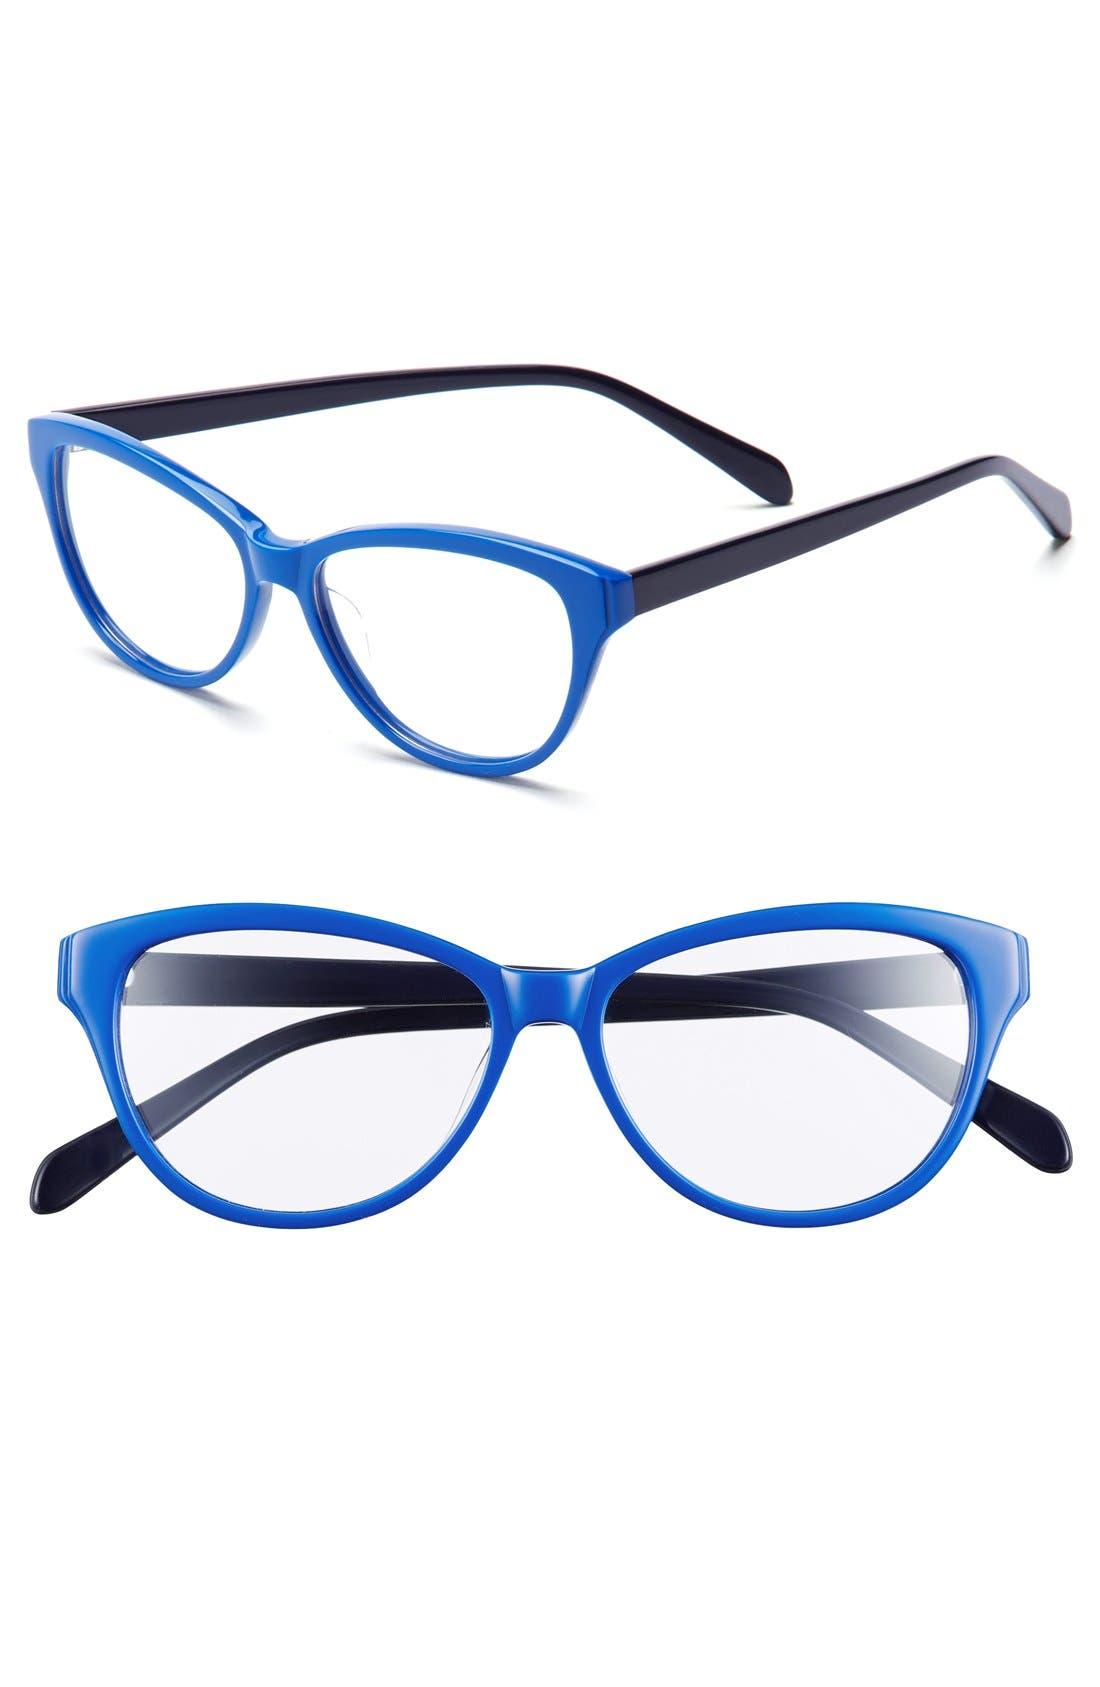 Alternate Image 1 Selected - Corinne McCormack 'Marge' 50mm Reading Glasses